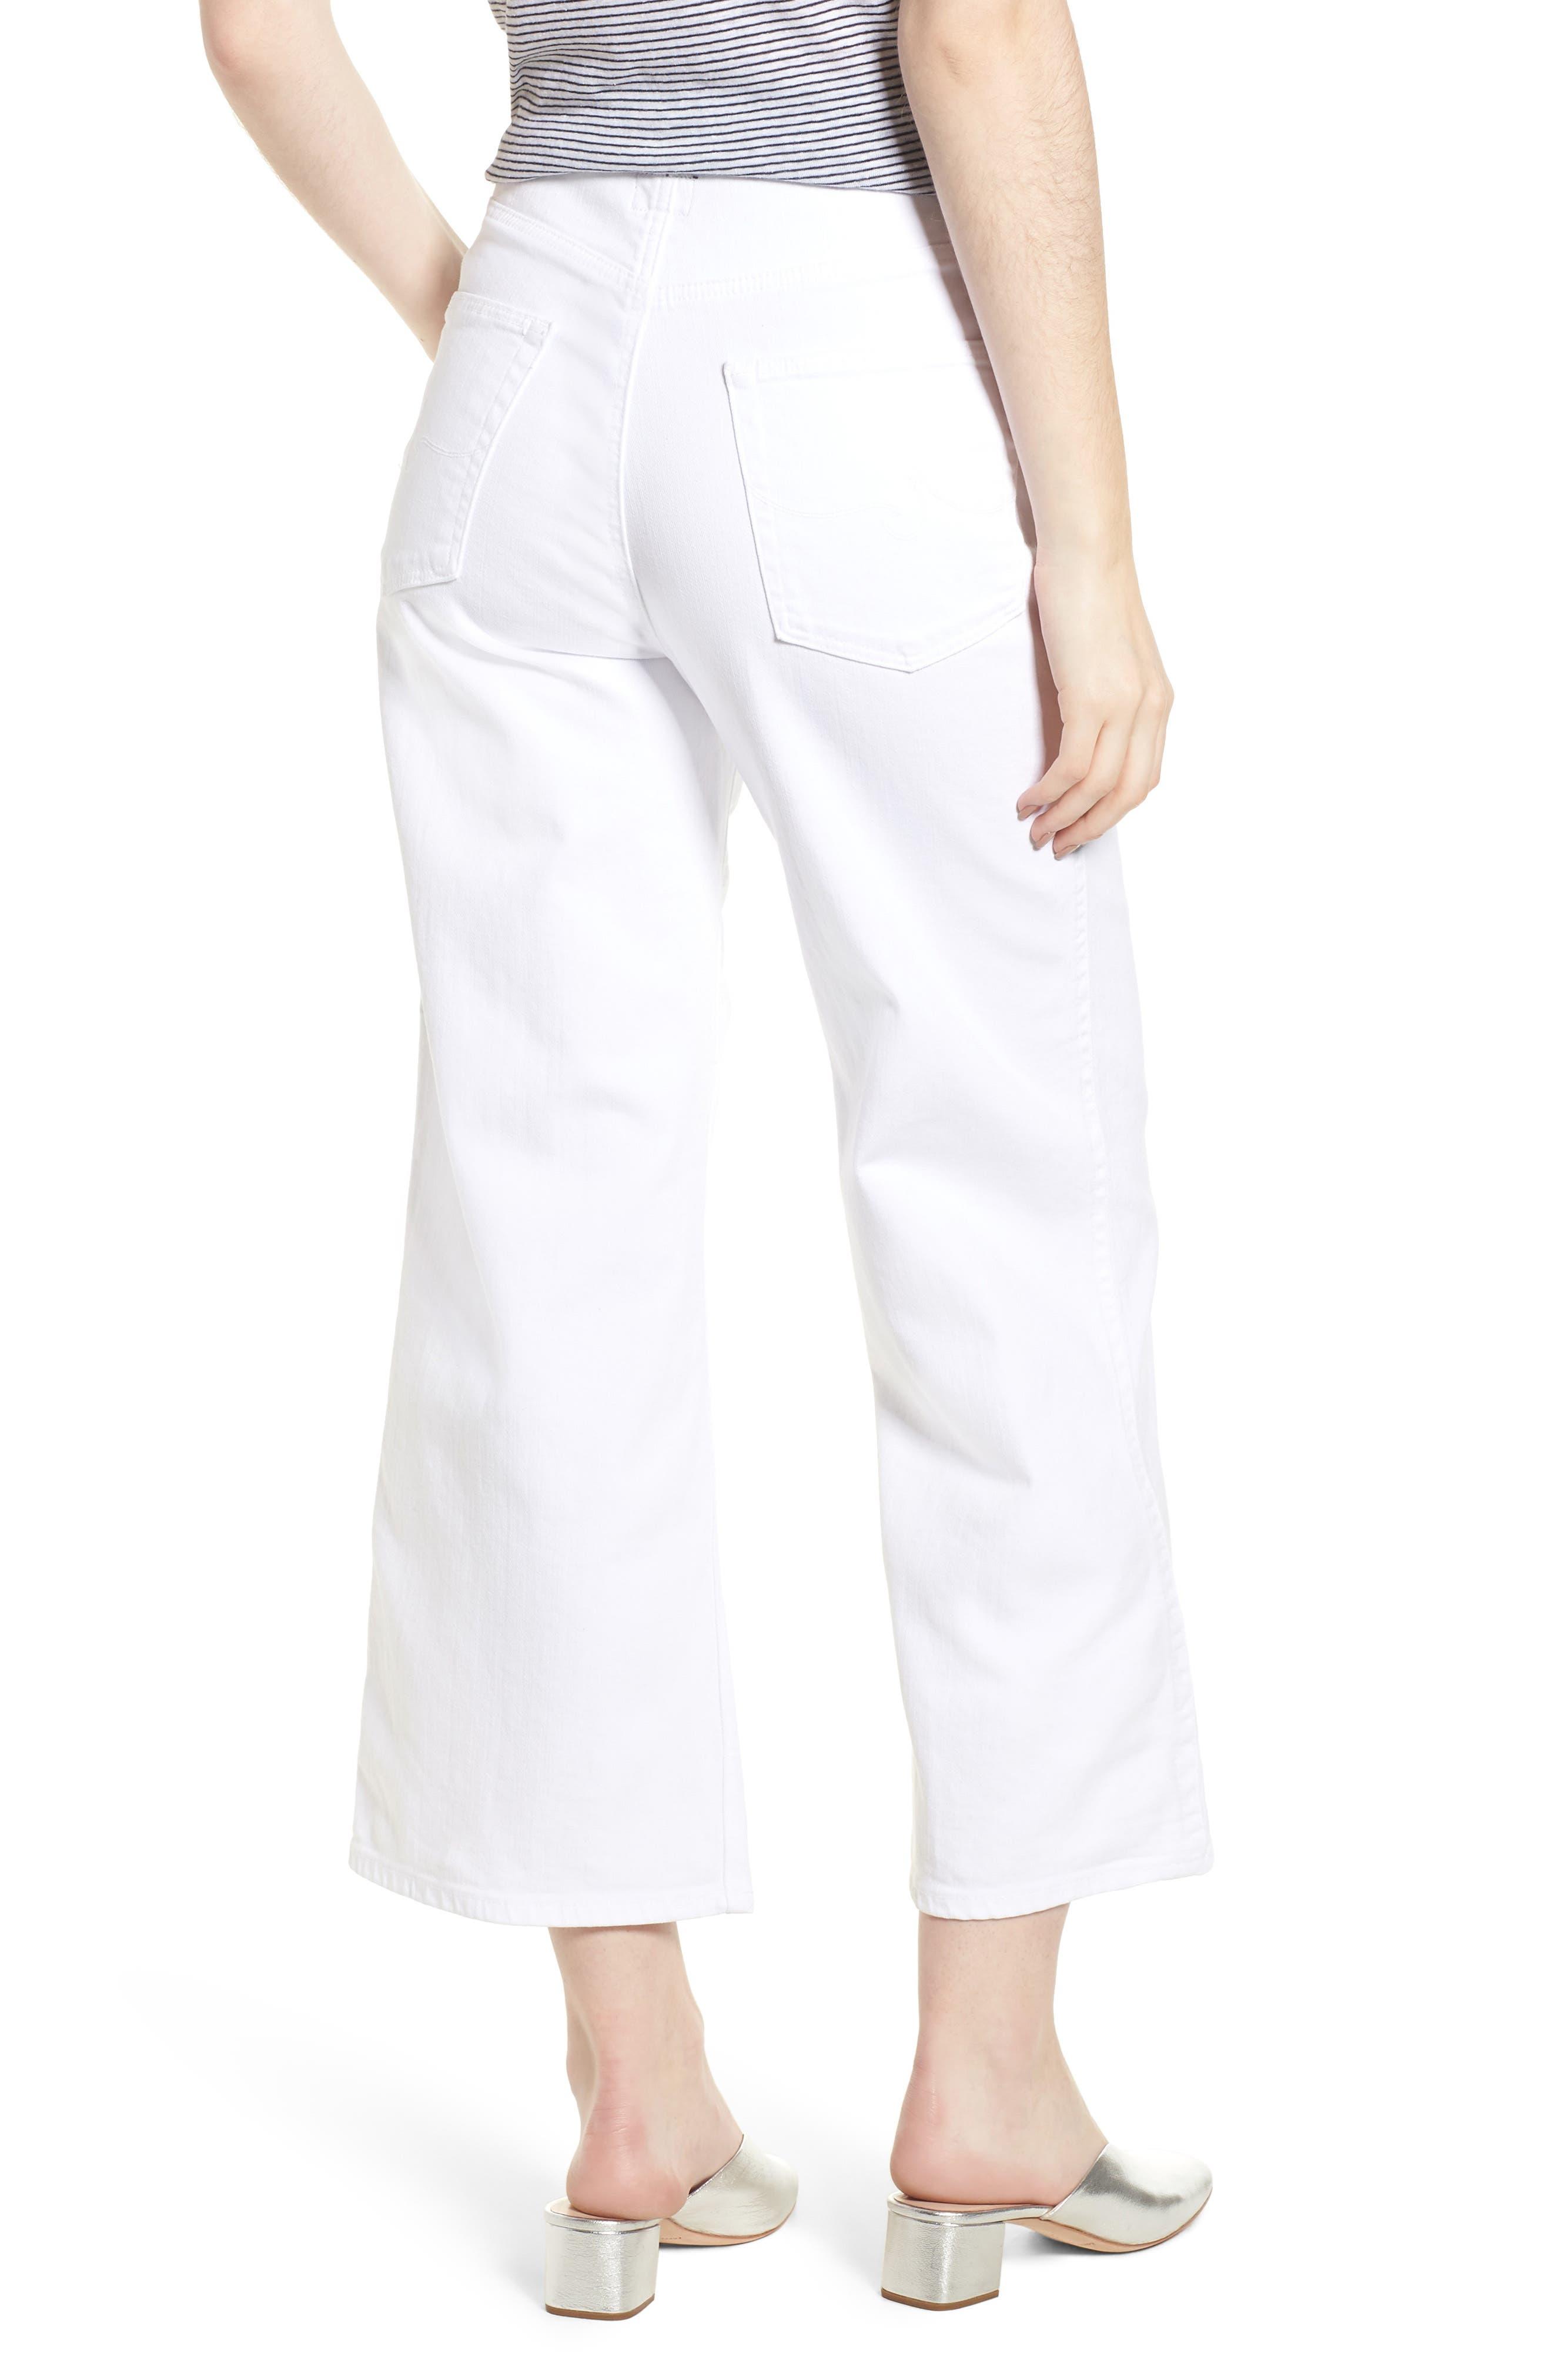 Etta High Waist Crop Wide Leg Jeans,                             Alternate thumbnail 2, color,                             110